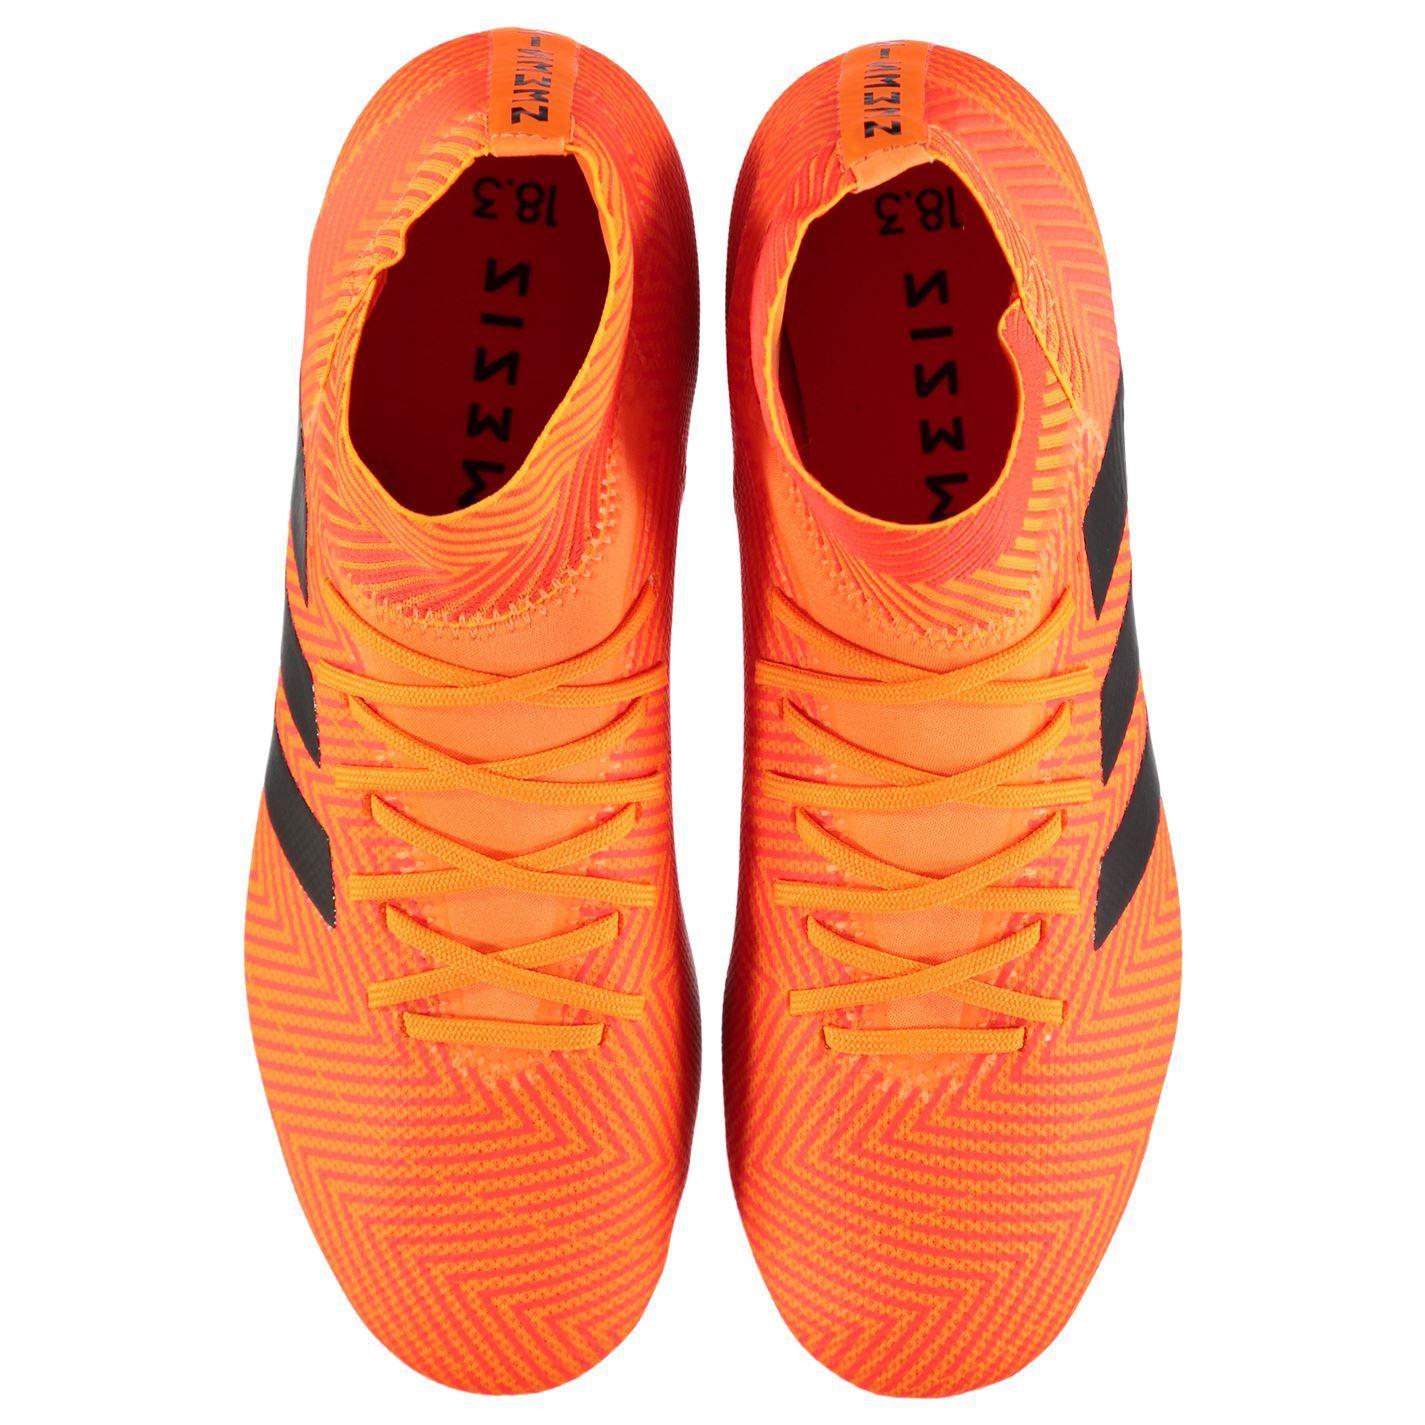 f9ae09f49 ... adidas Nemeziz 18.3 Firm Ground Football Boots Mens Orange Soccer Shoes  Cleats